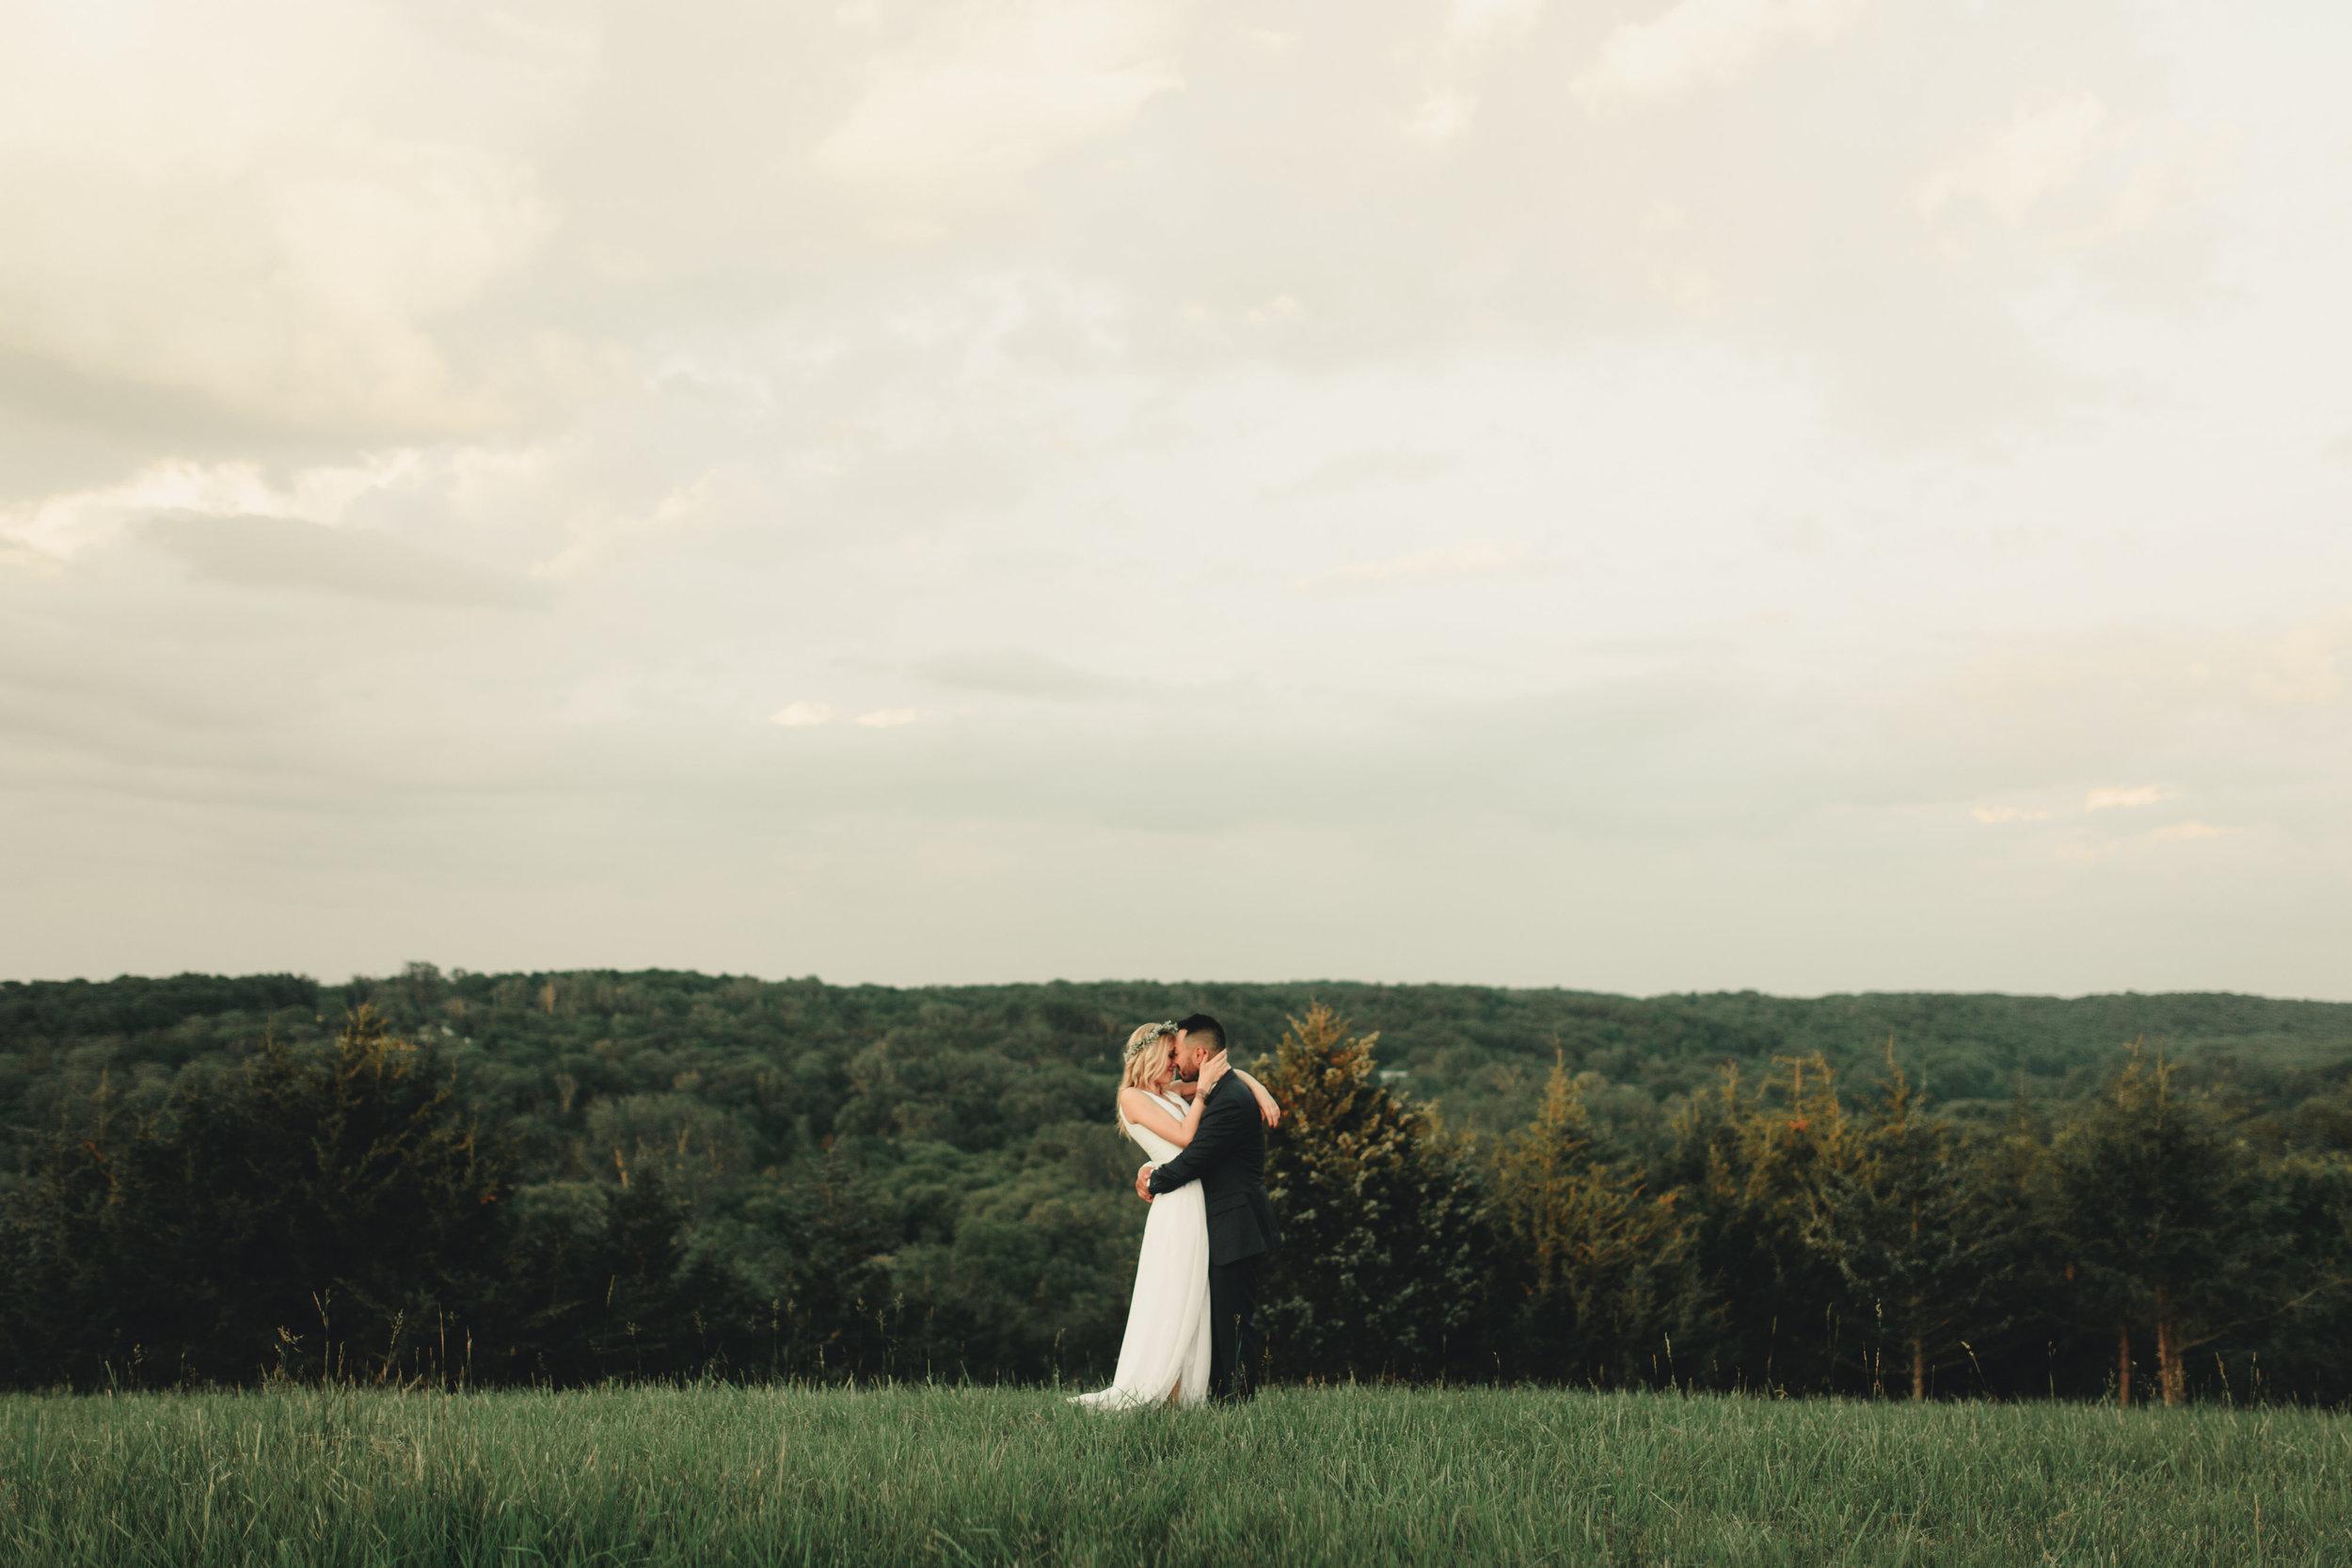 Emily and Zach-Wedding Finals 2-0149.jpg